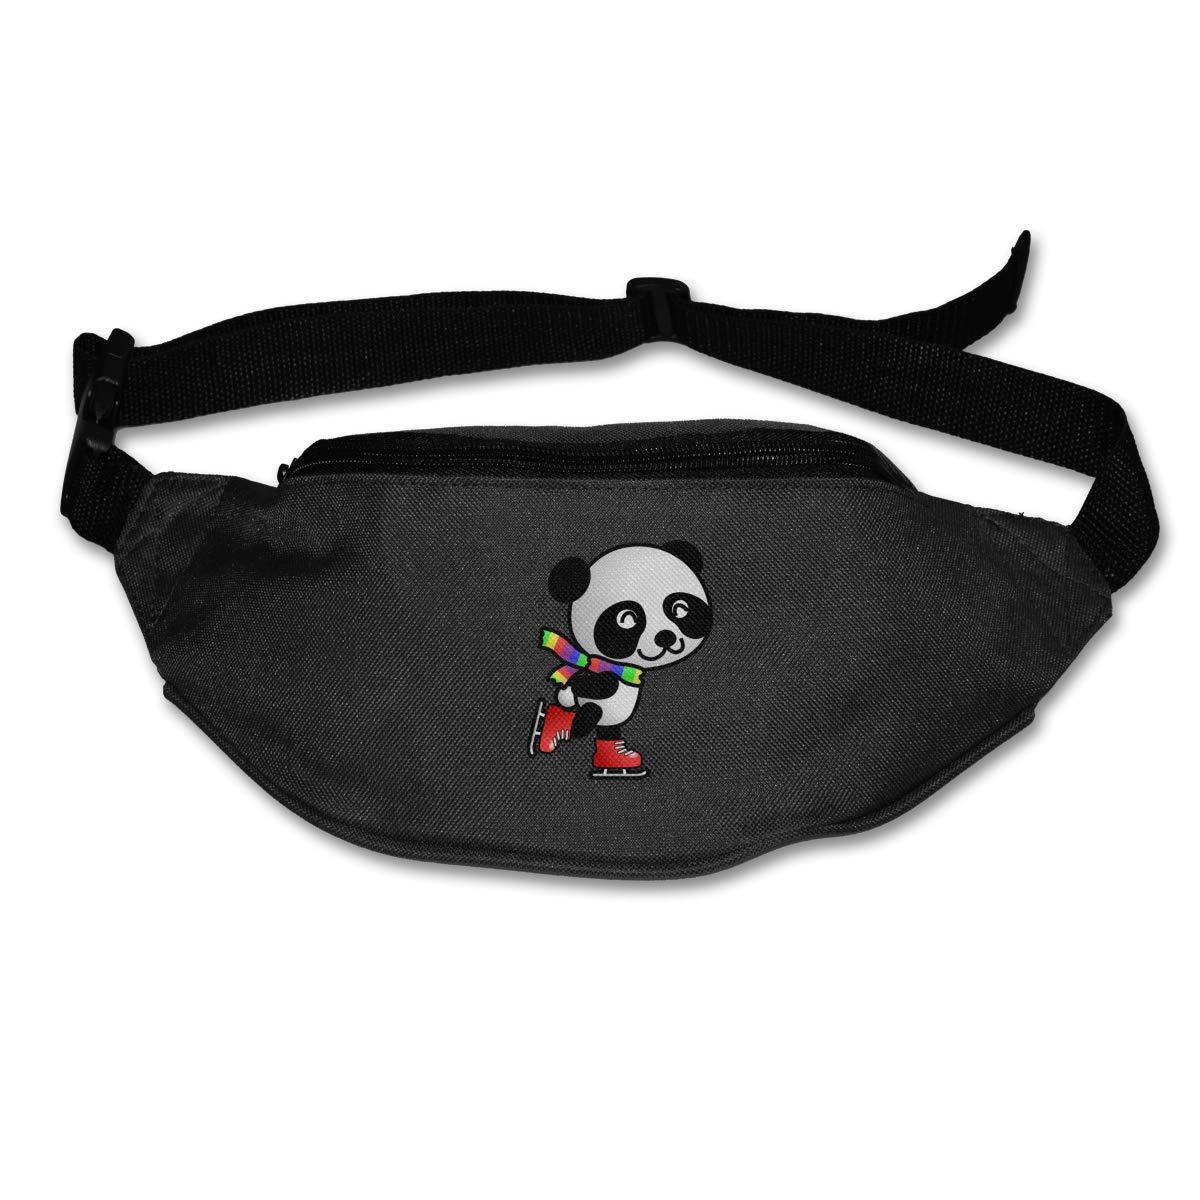 Kawaii Rainbow Panda Skating Sport Waist Packs Fanny Pack Adjustable For Travel